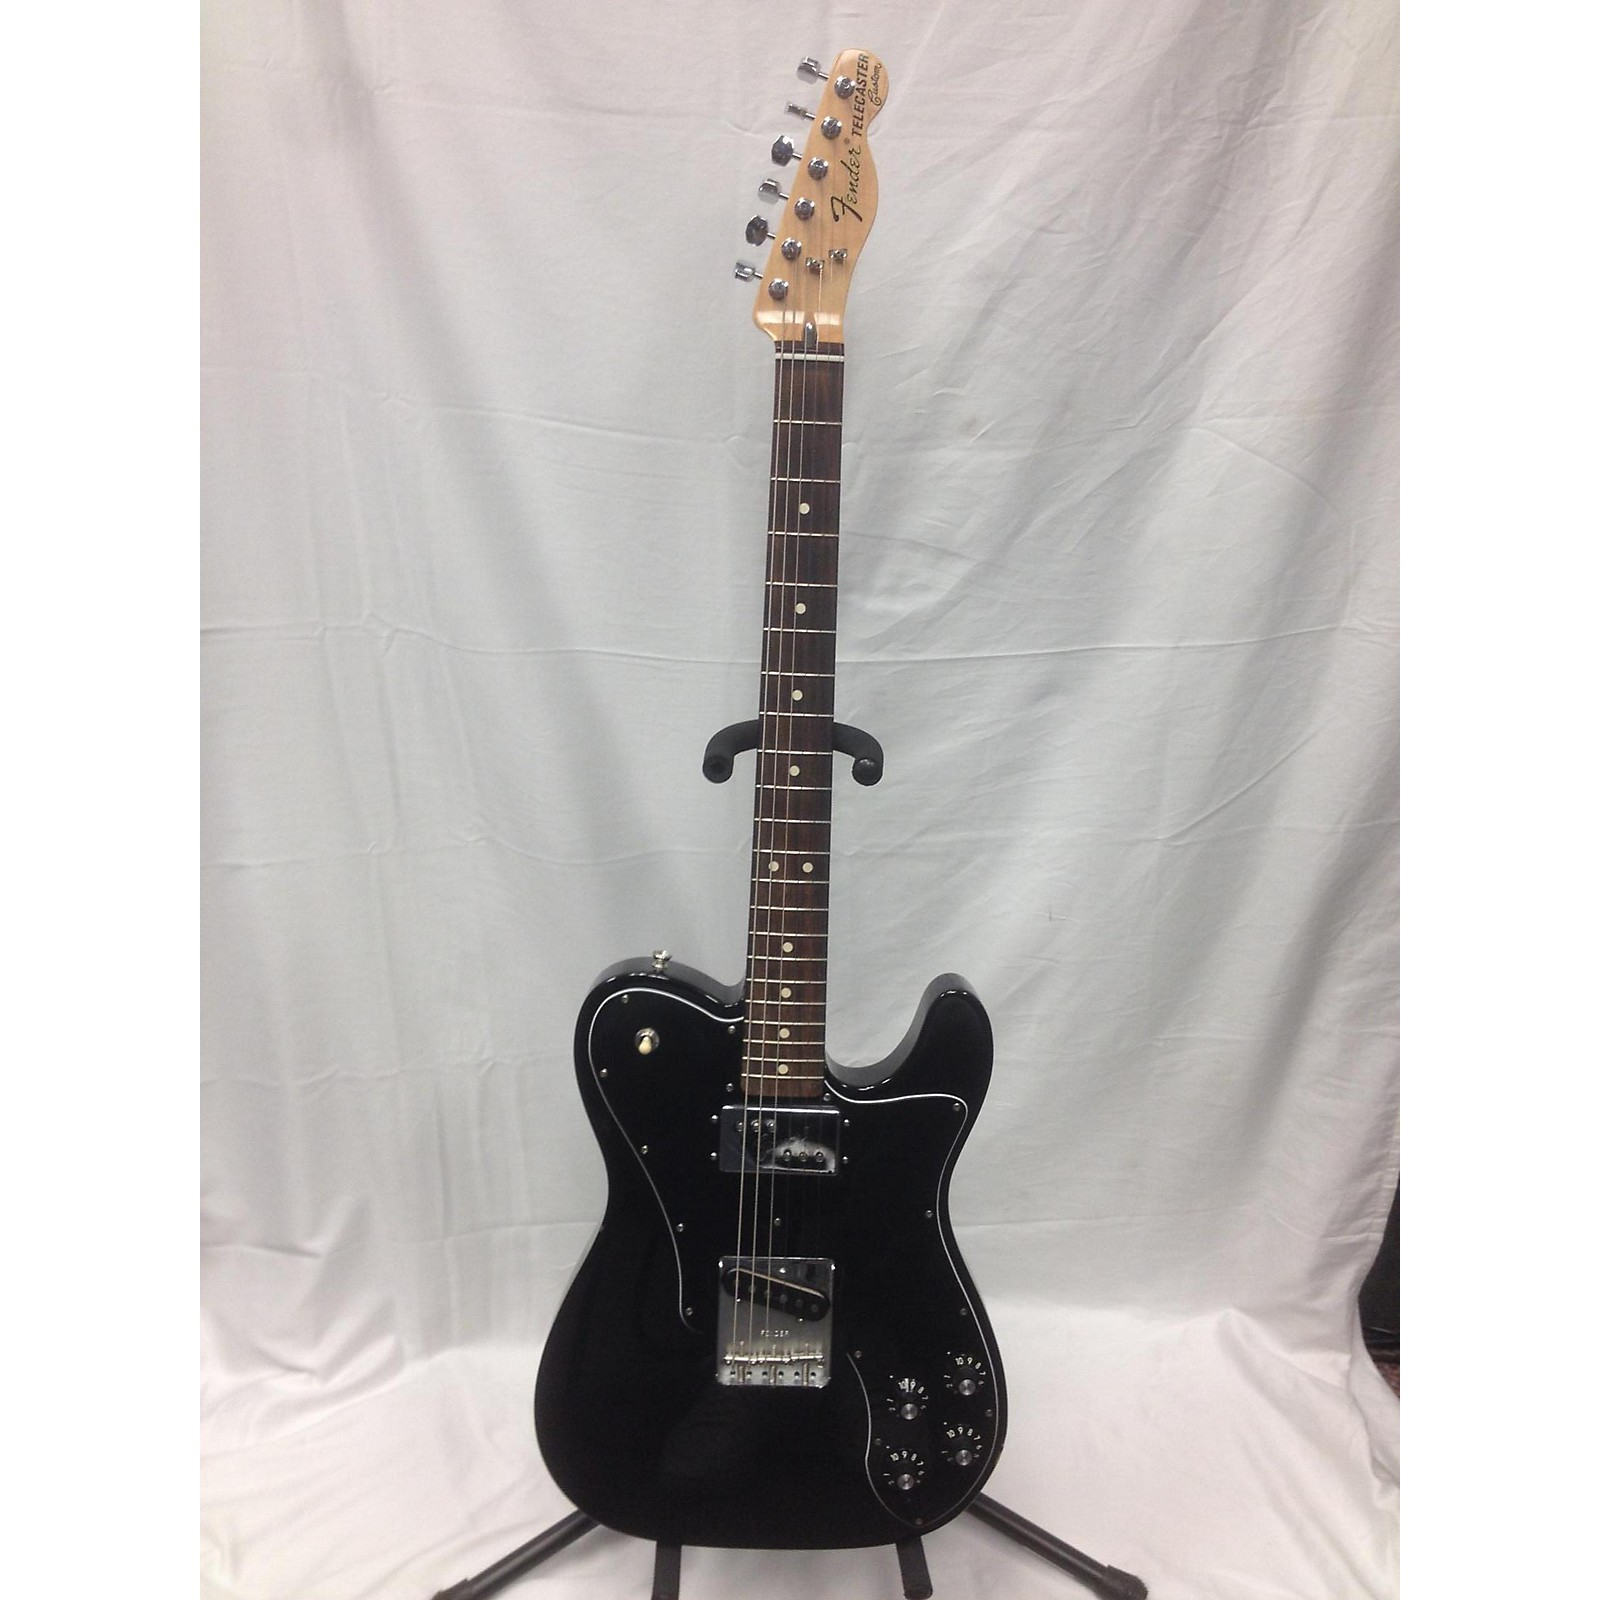 Fender Telecaster Custom Solid Body Electric Guitar